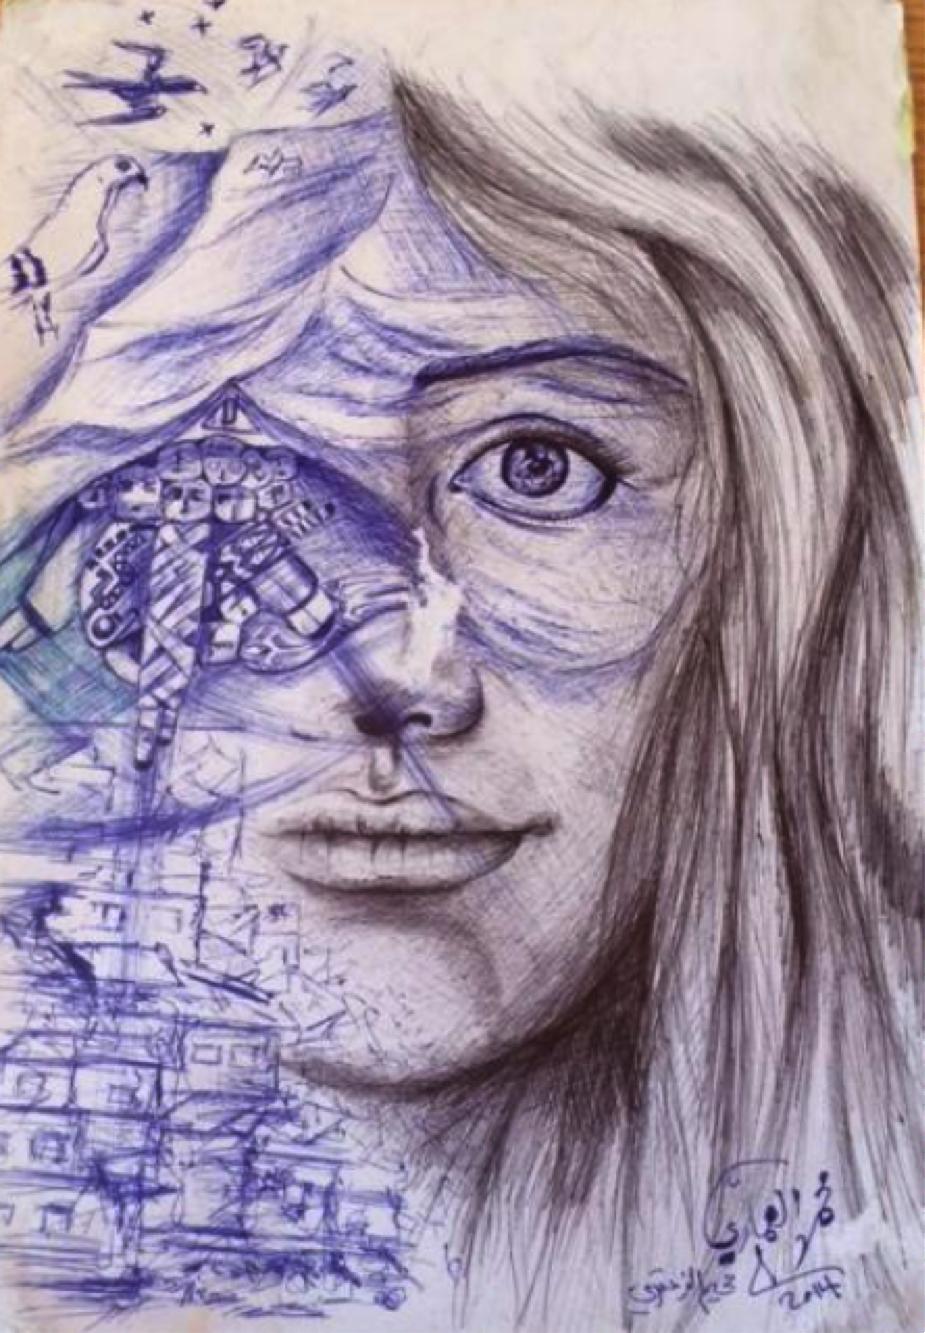 ART IN CRISIS: MEET THE ARTISTS